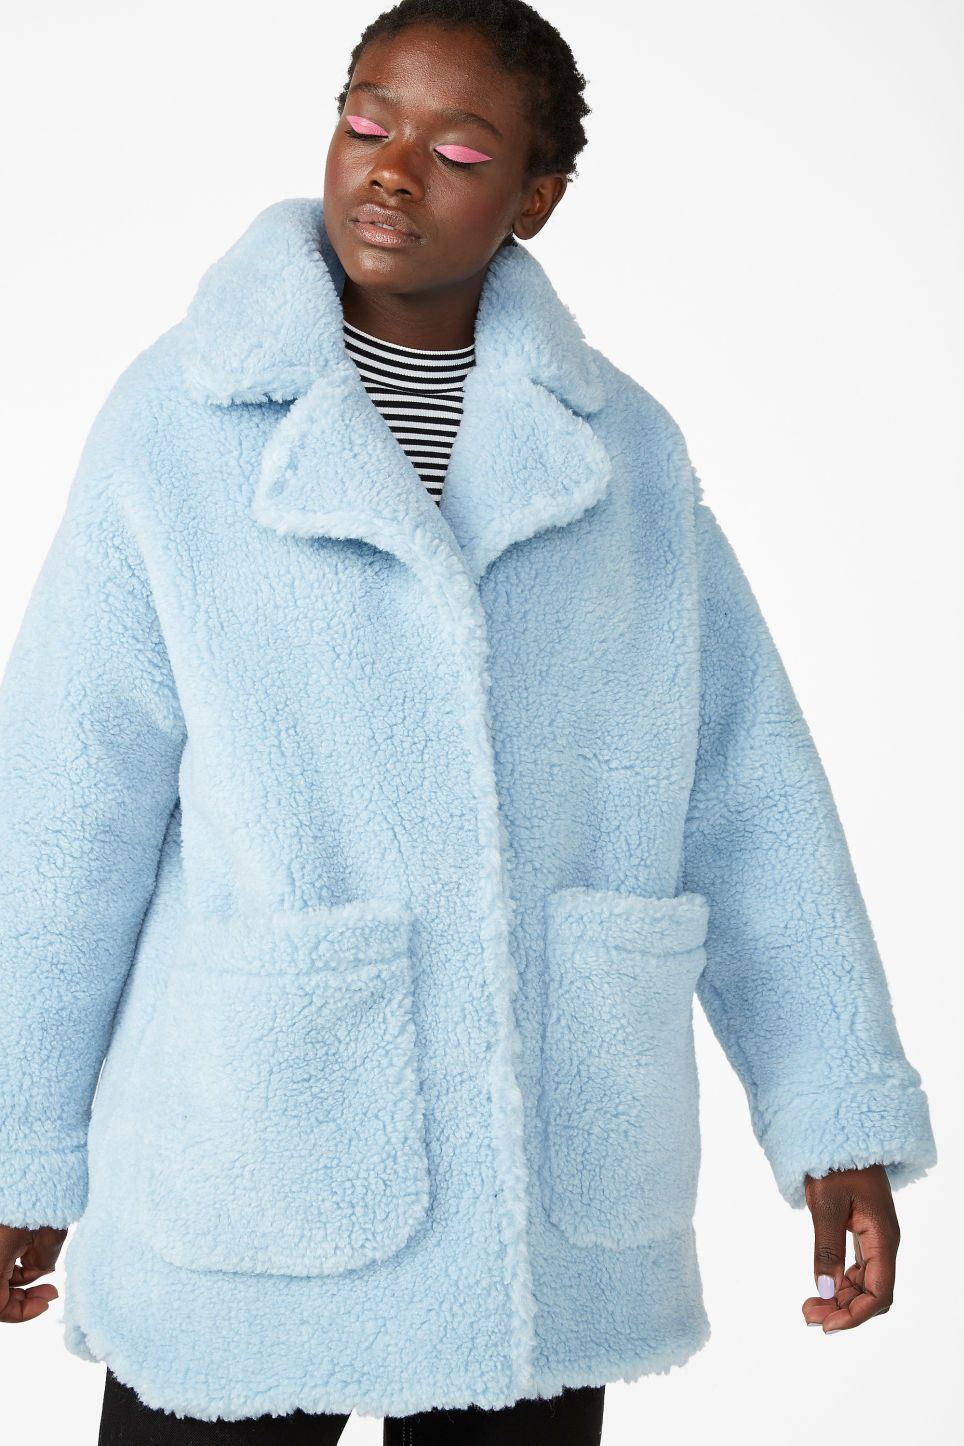 8694c089b93b Oversized faux shearling coat - Pale sky blue - Coats   Jackets ...